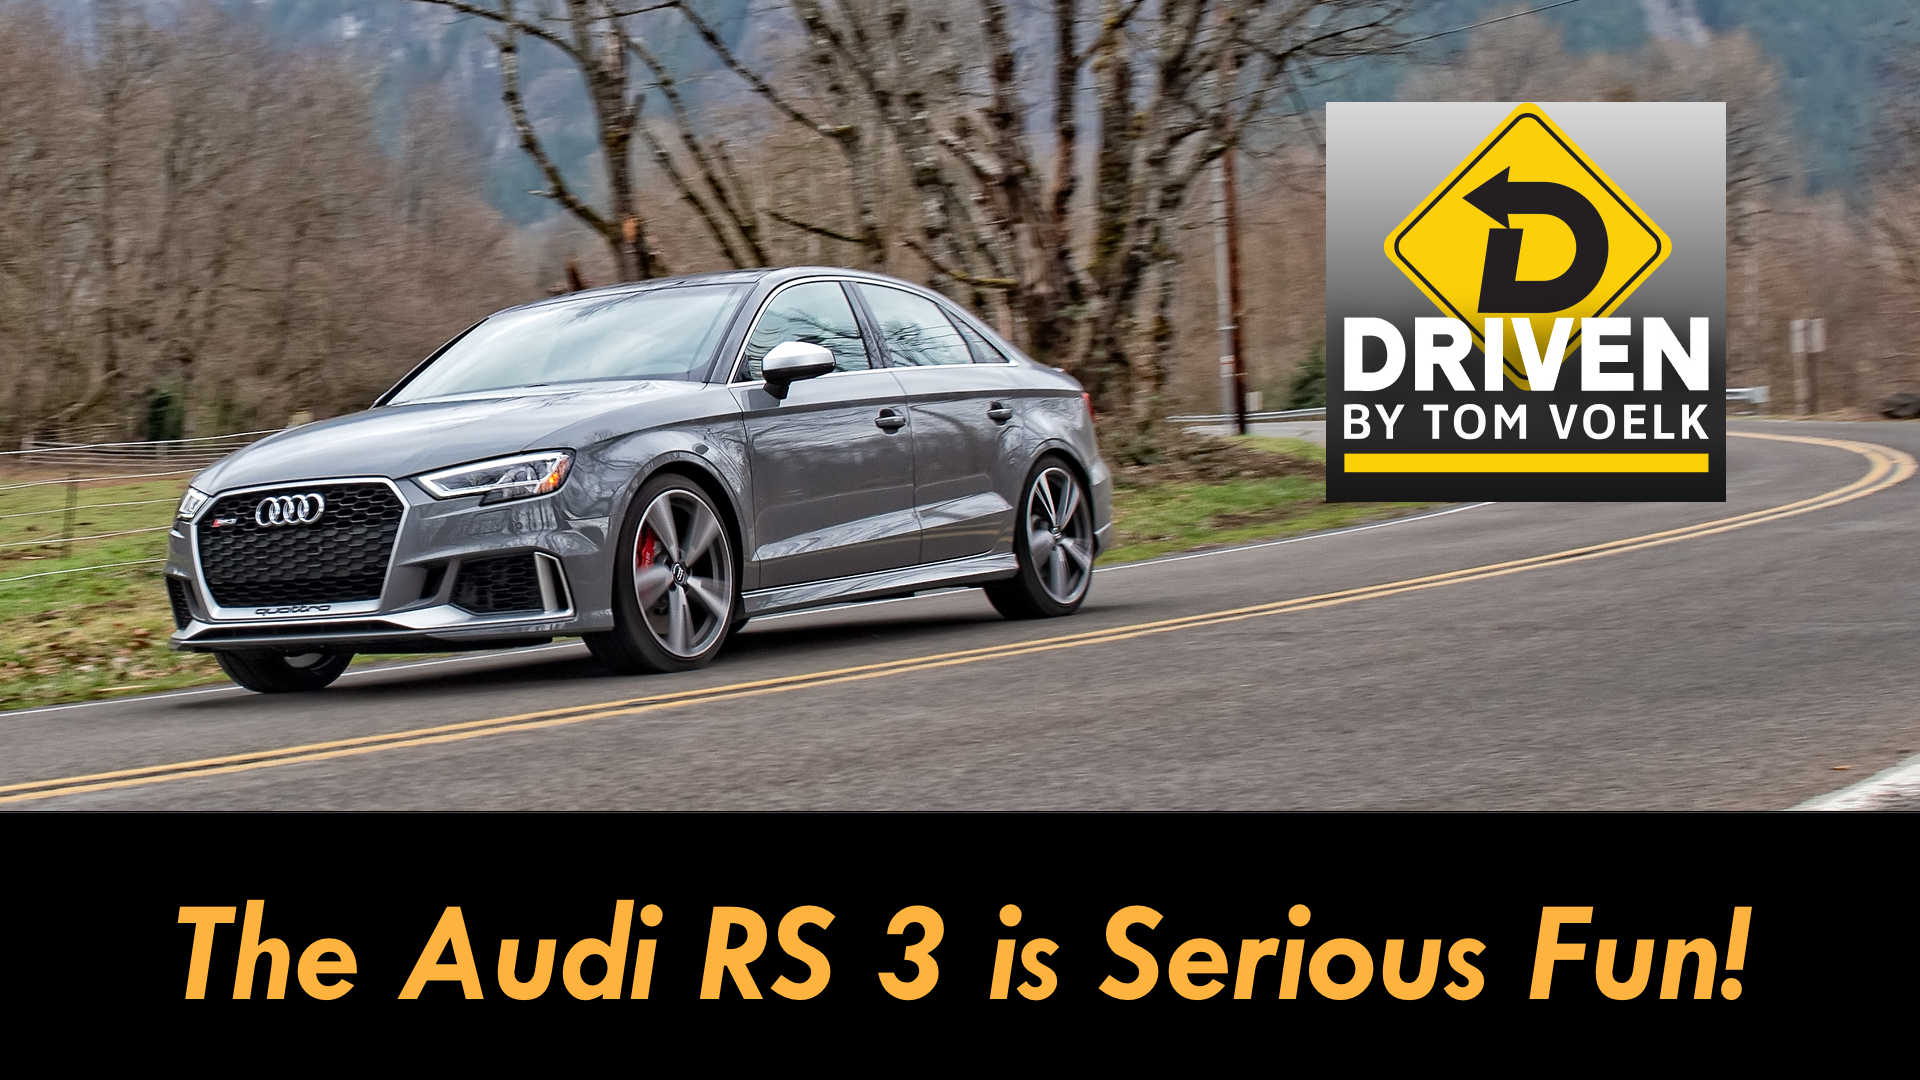 Artwork for 2019 Audi RS 3